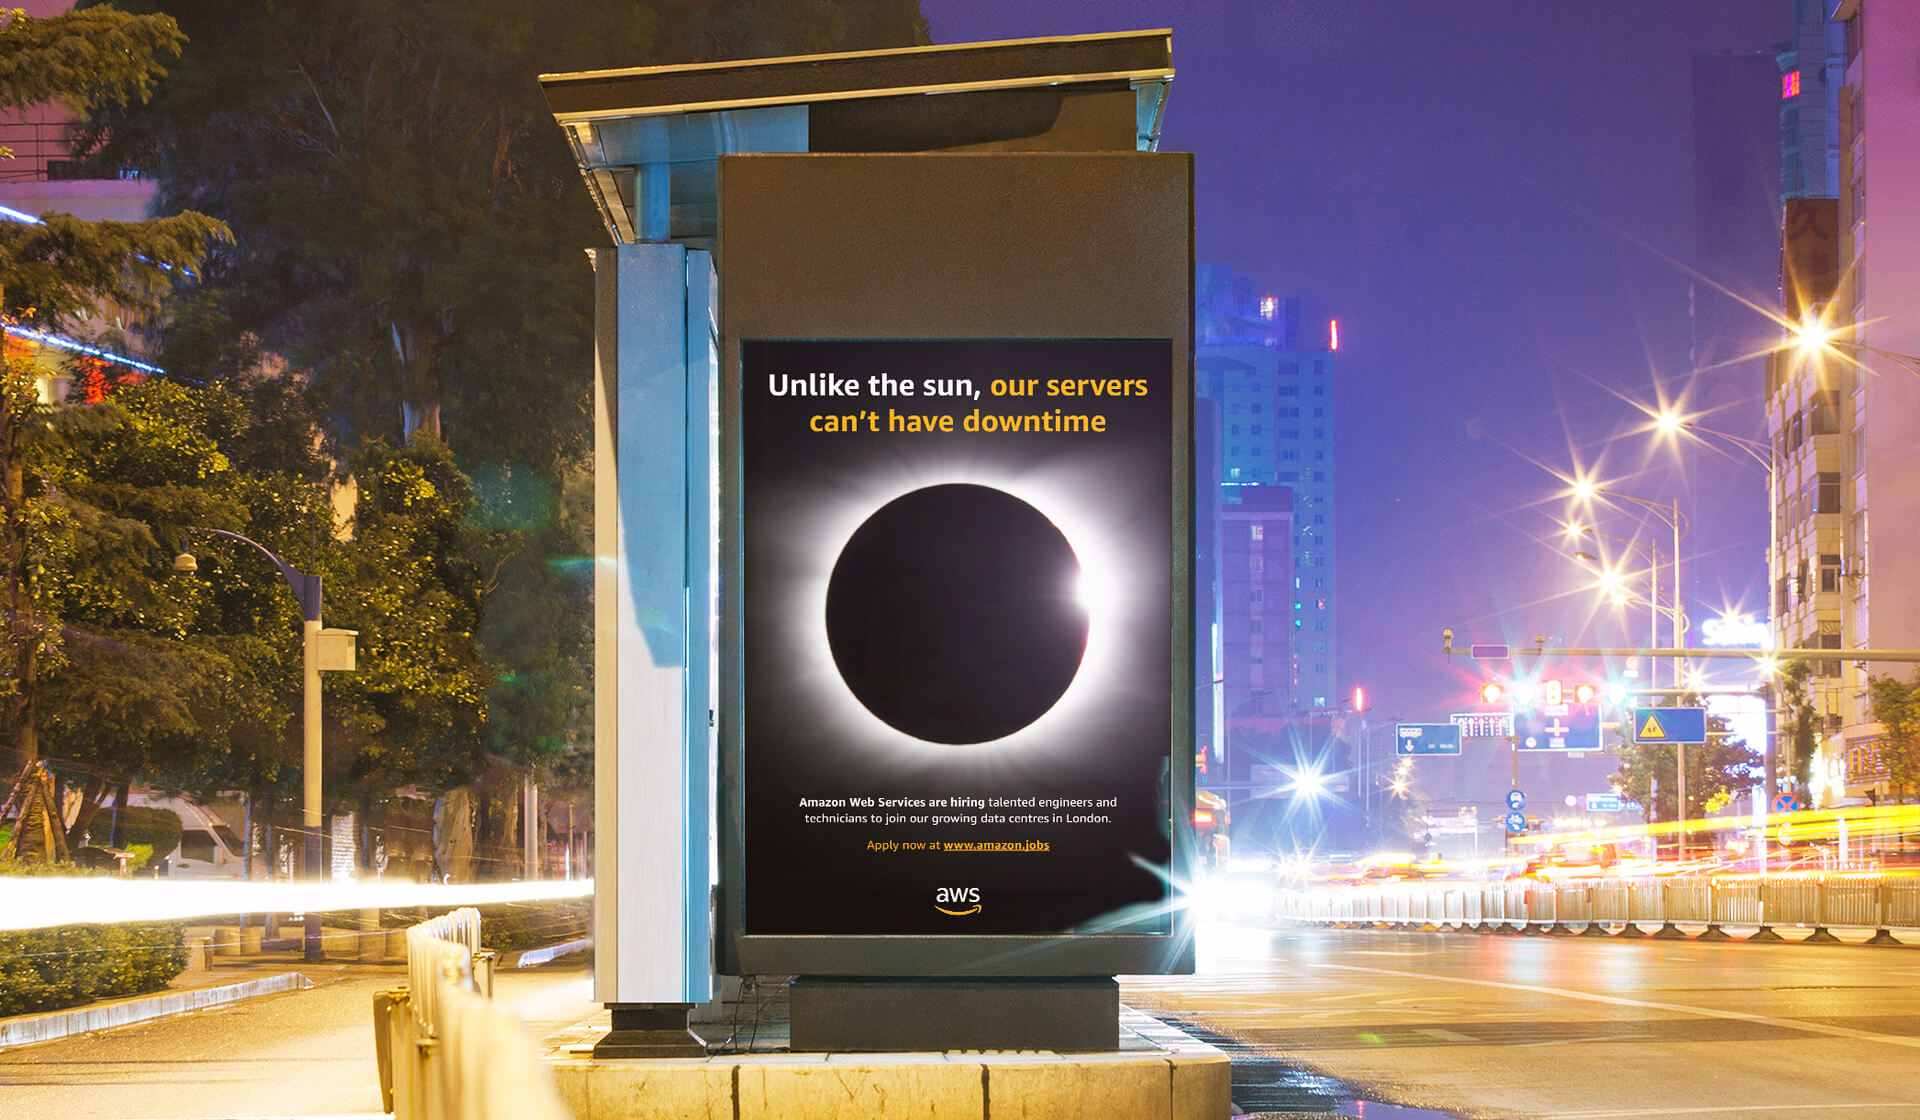 Mellor&Smith - Amazon - Unlike The Sun Advertising Campaign